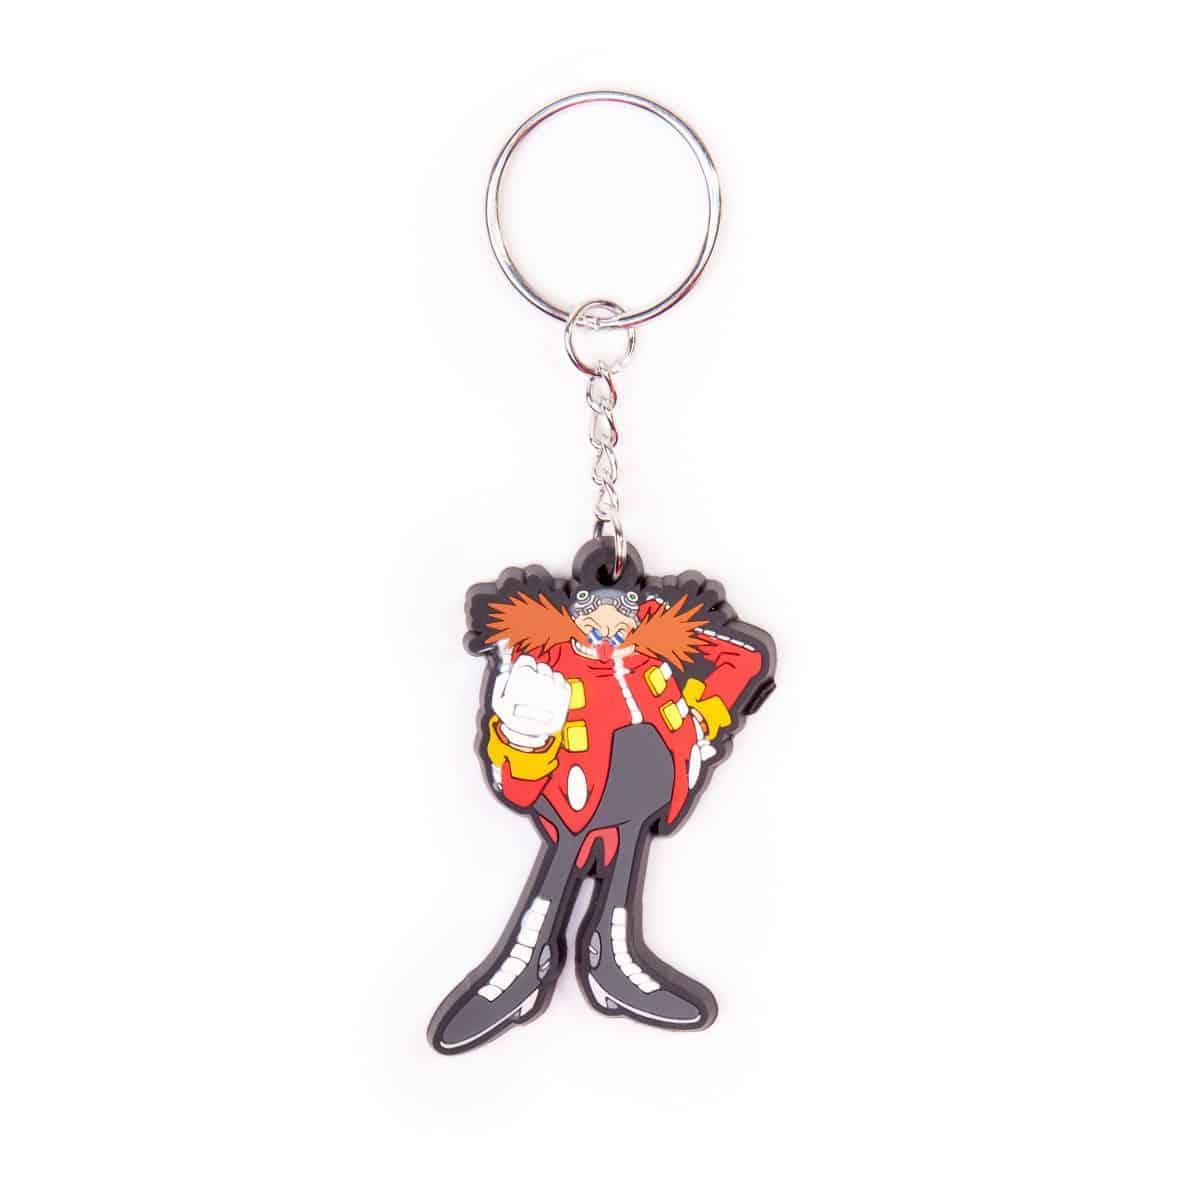 Sega - Dr. Eggman Rubber Keychain